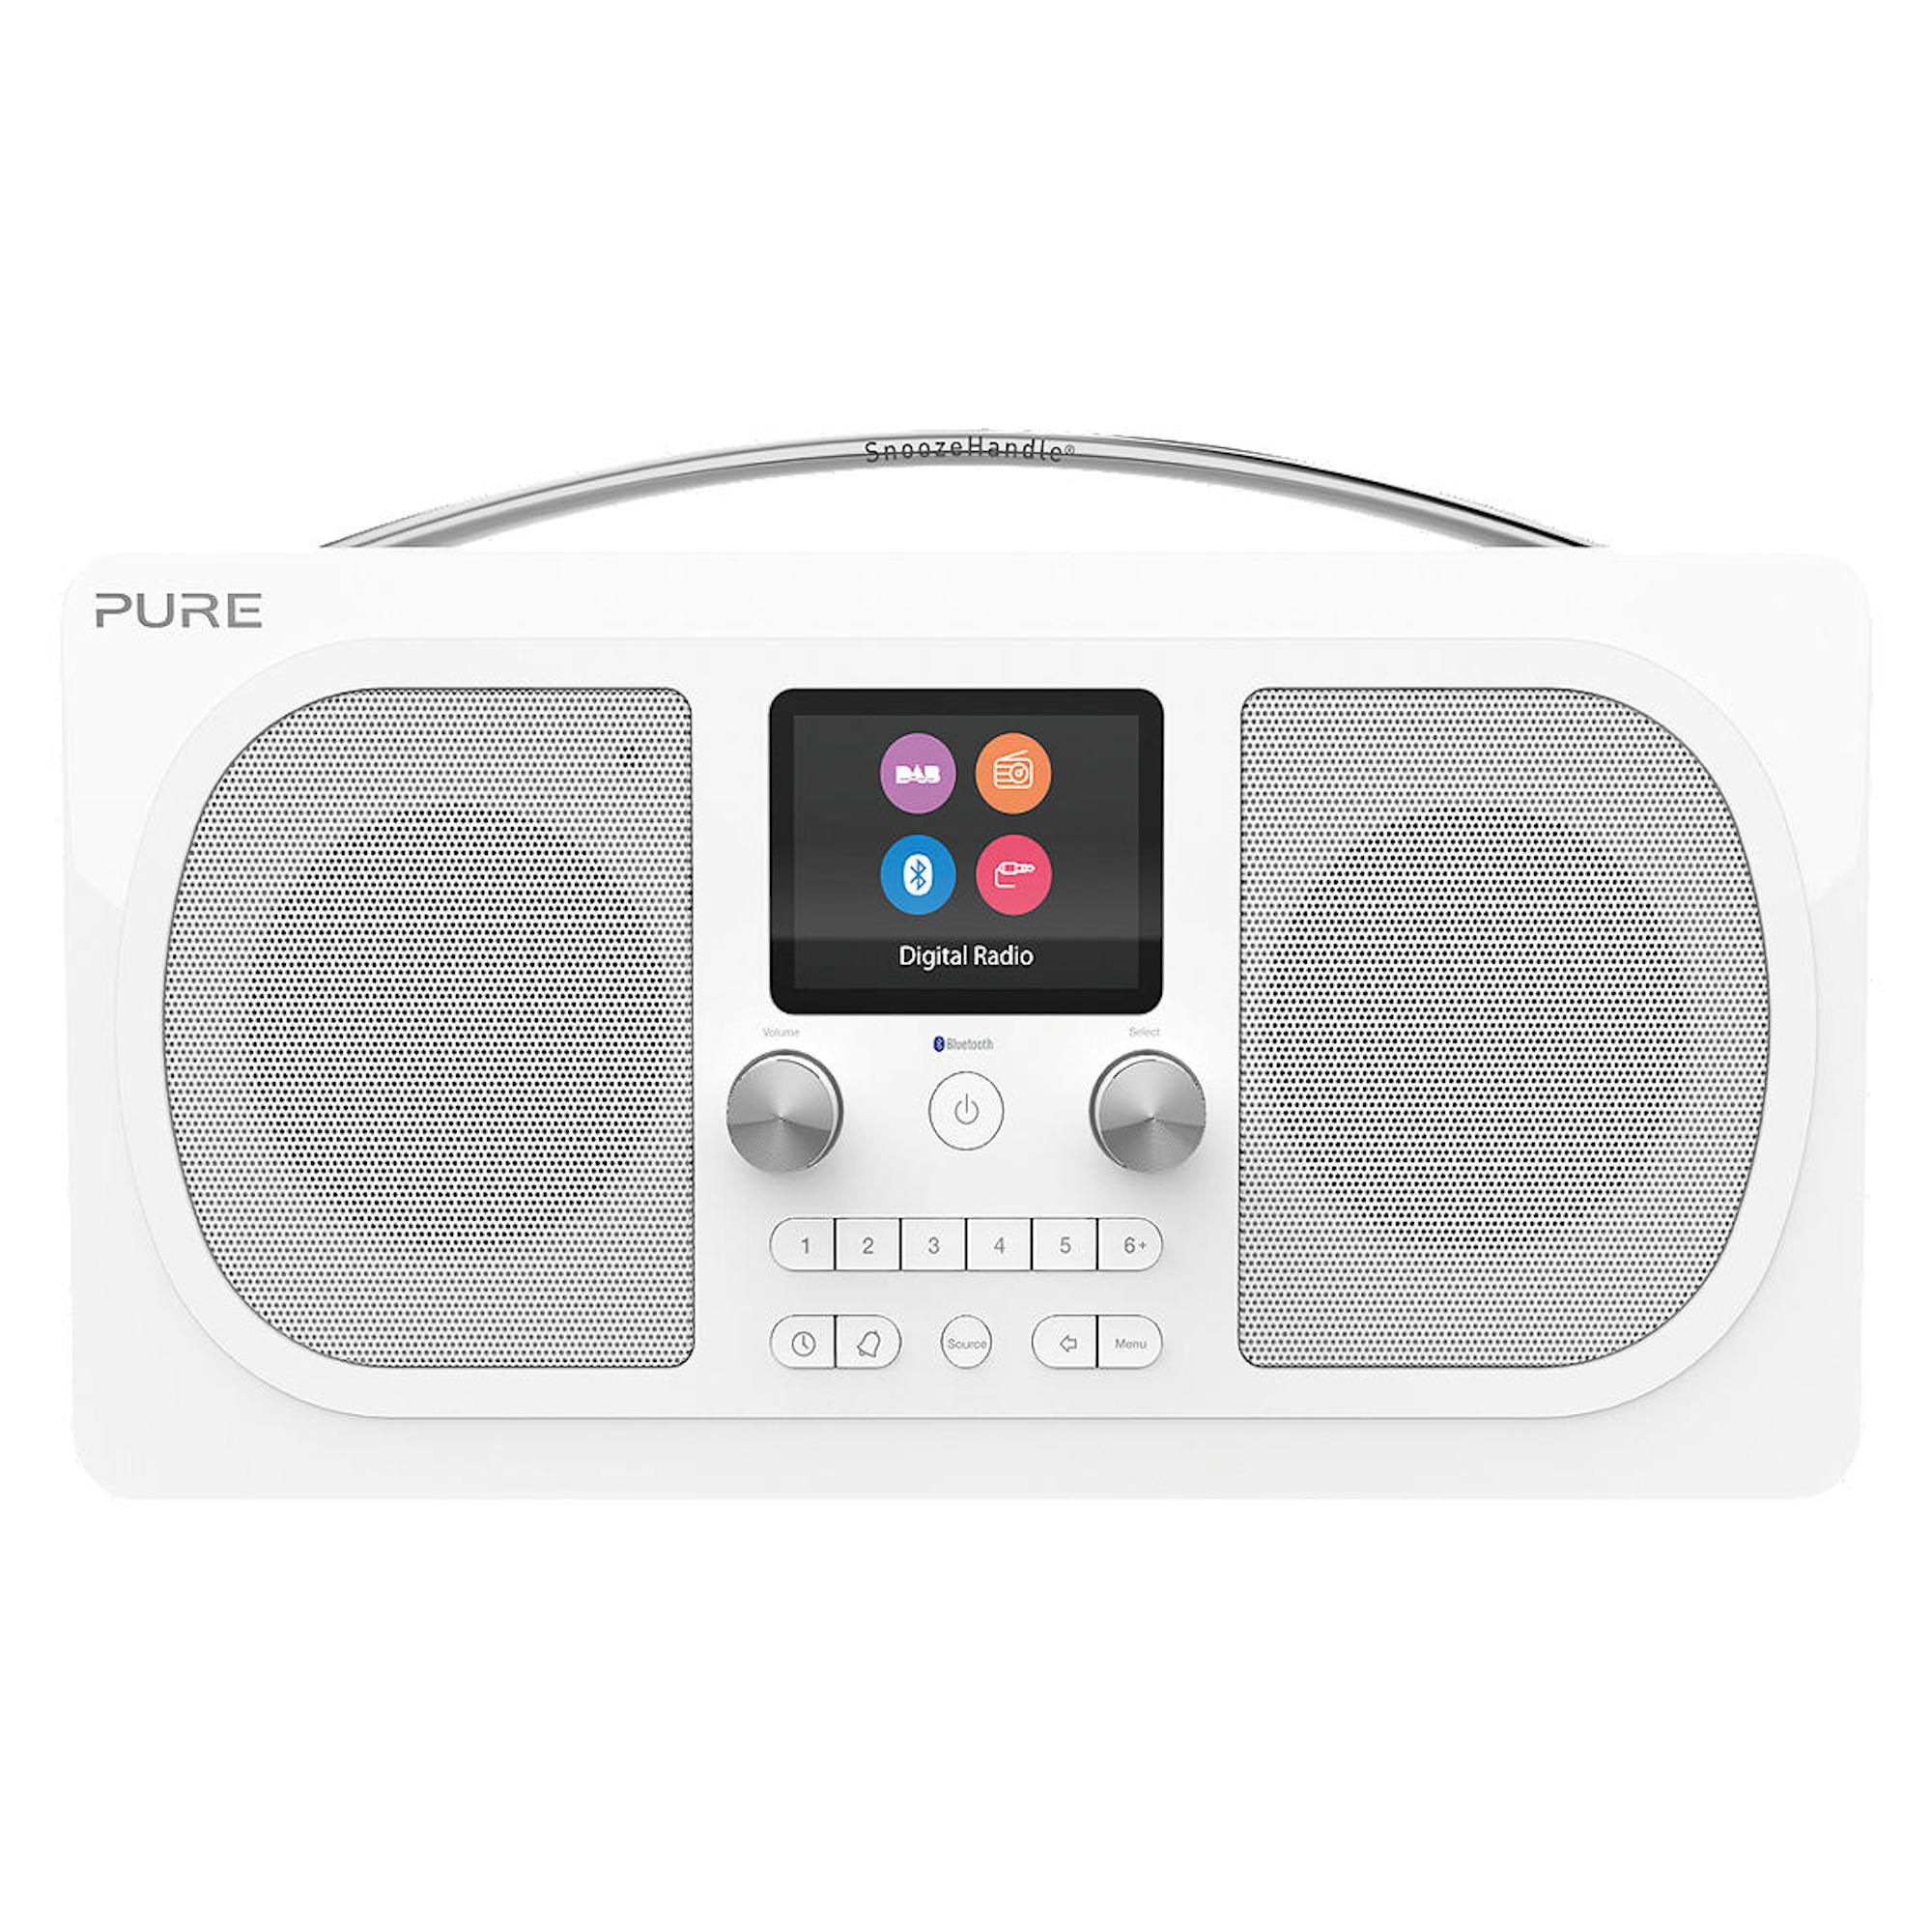 Pure EVOKE H6 PRESTIGE DAB/DAB+ Stereo Bluetooth Radio - White £147 @ Hughes